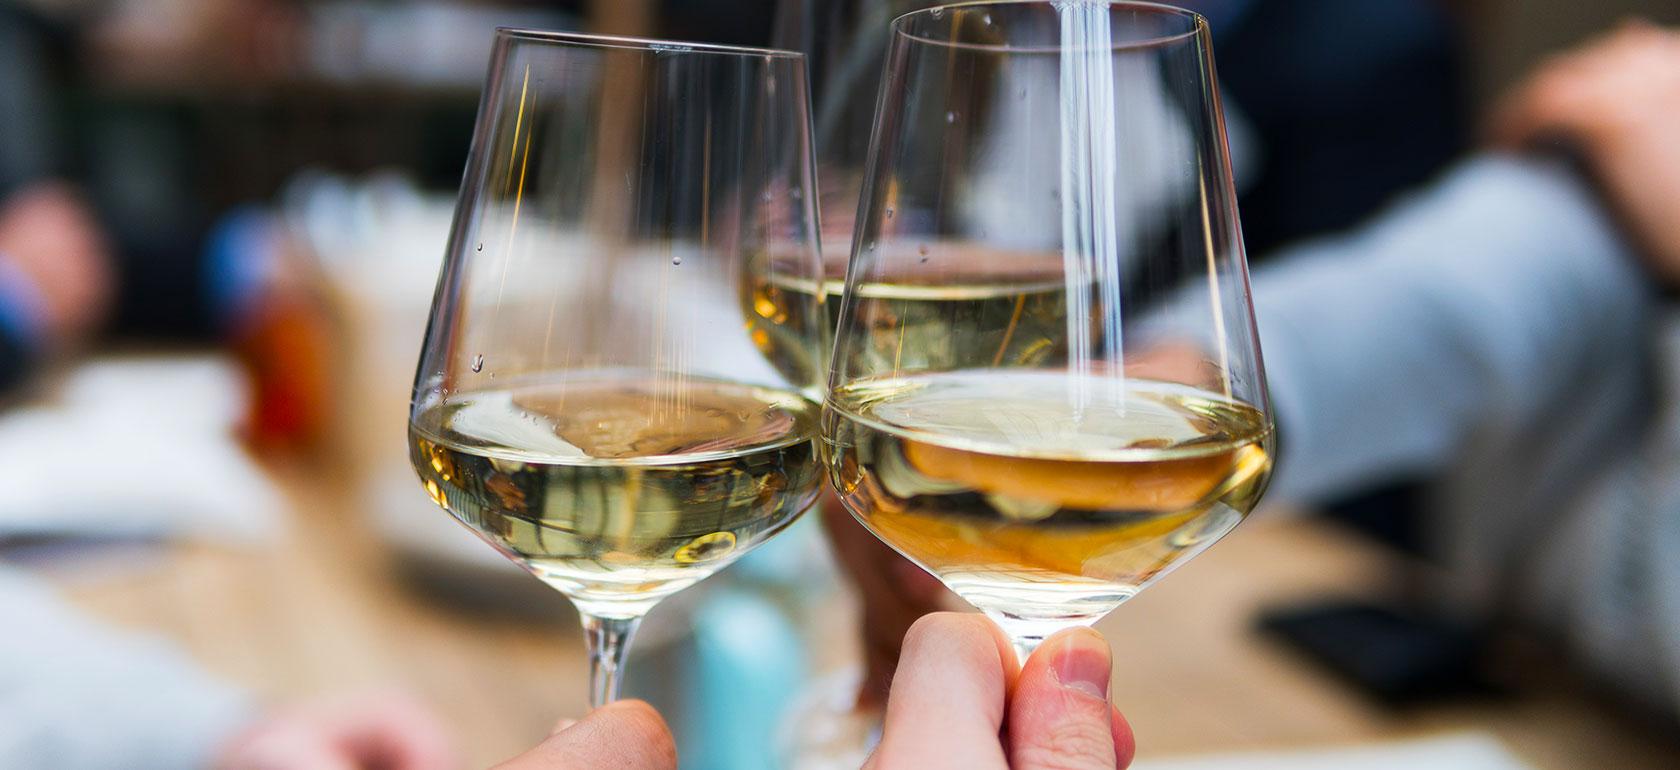 Cata de vino catal n en barcelona for Cata de vinos barcelona